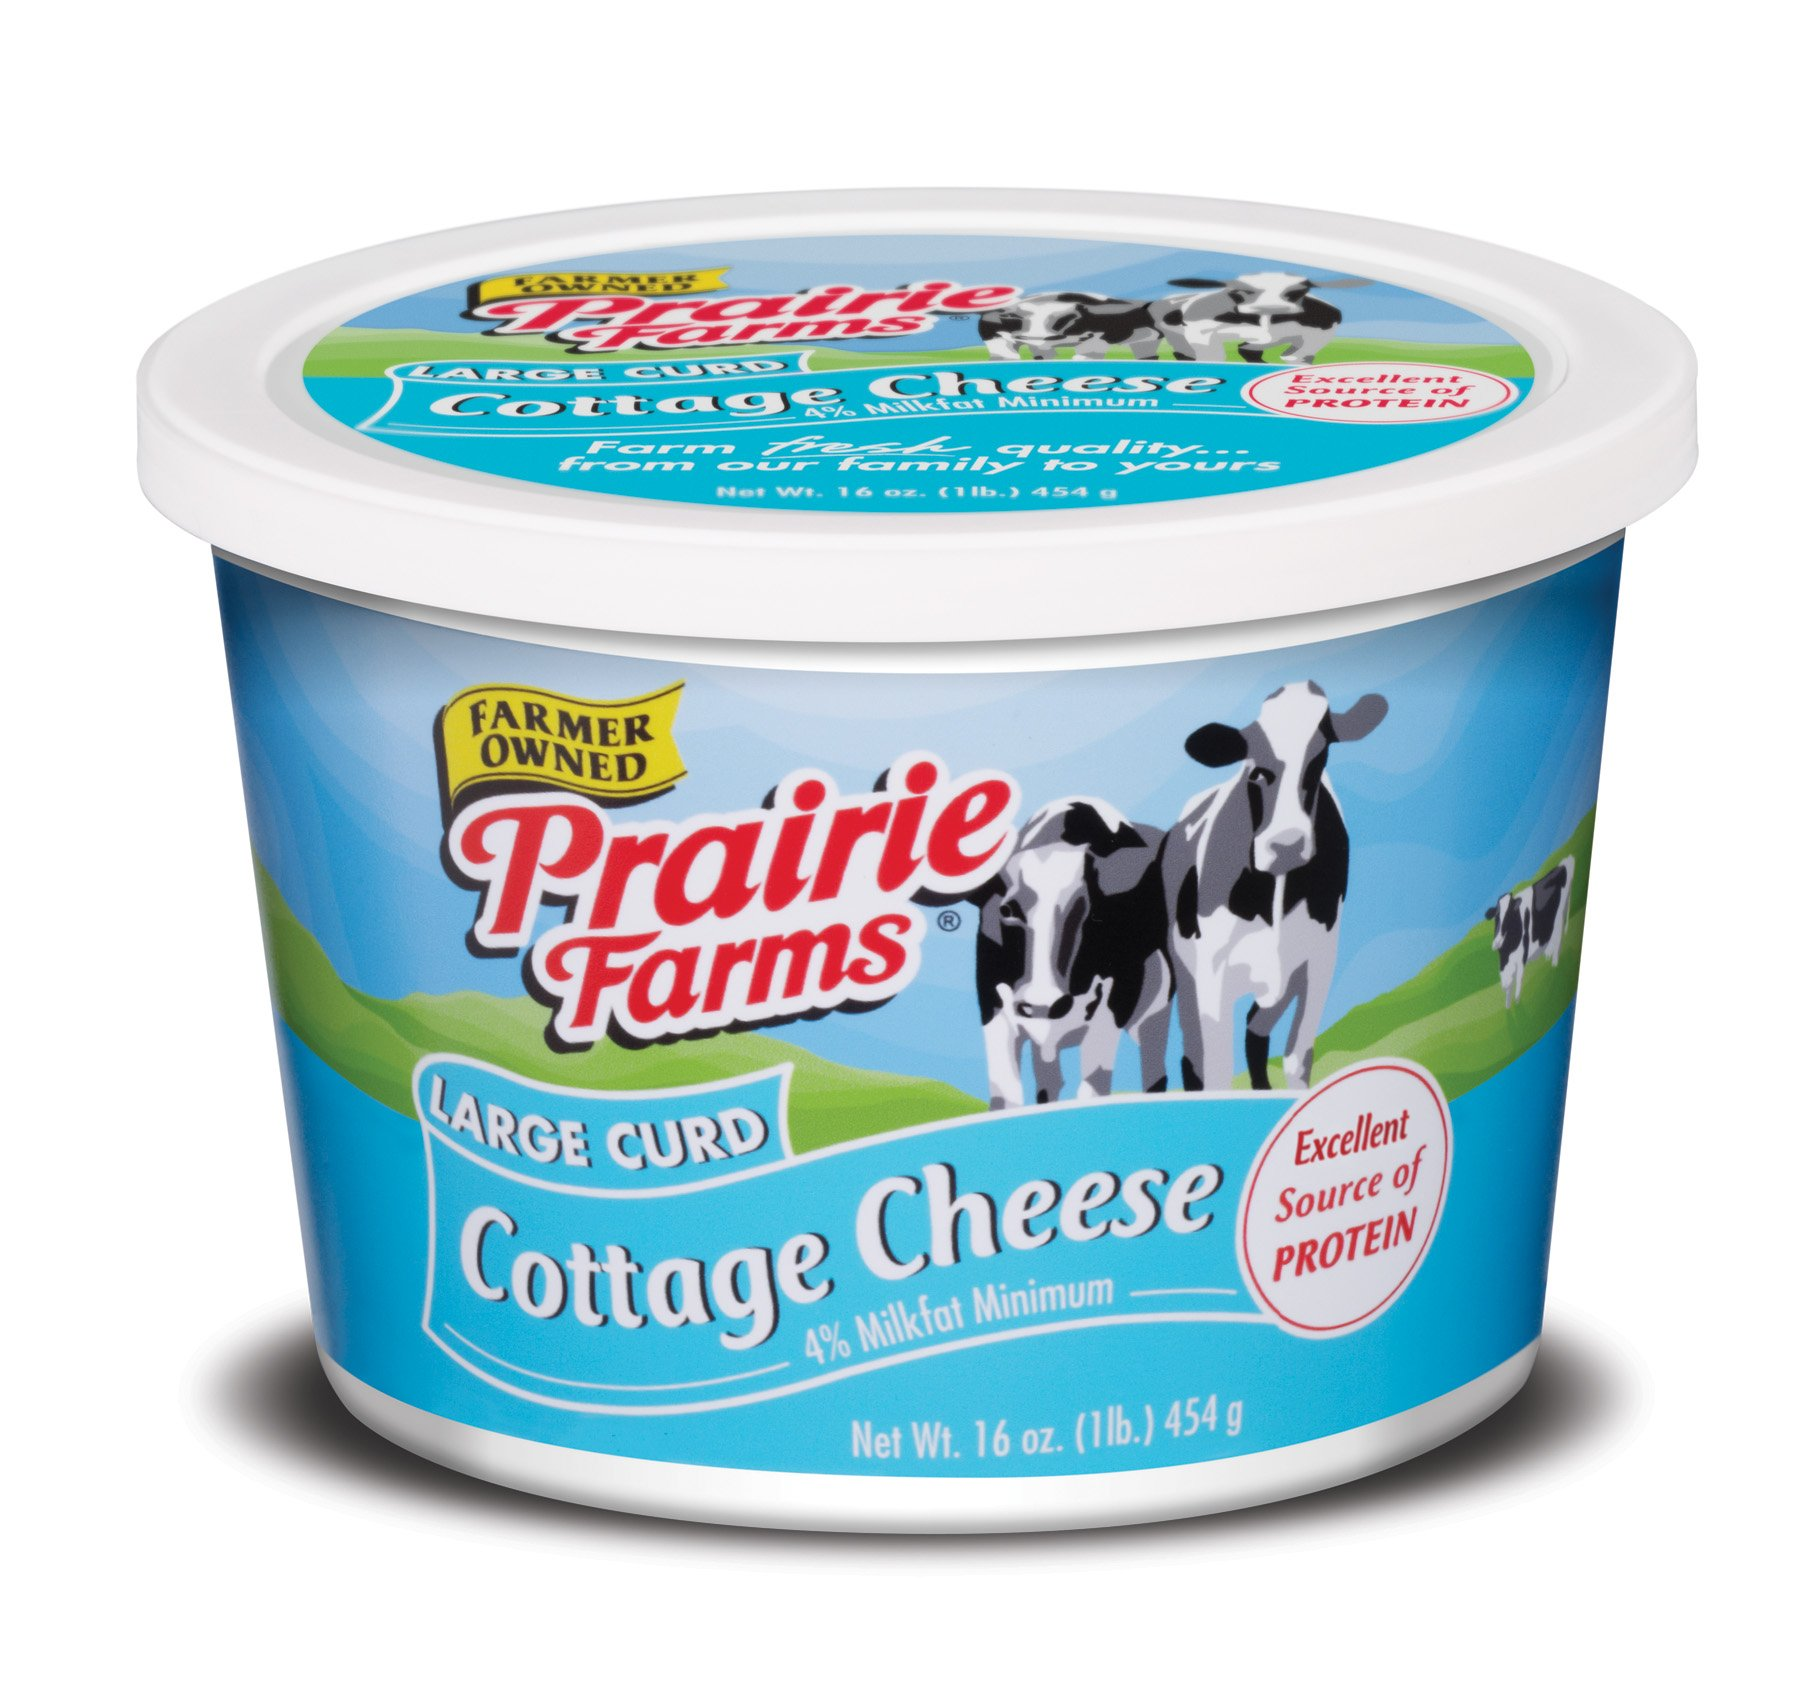 Prairie Farms Dairy 1 LB Cottage Cheese Large Curd, 16 oz